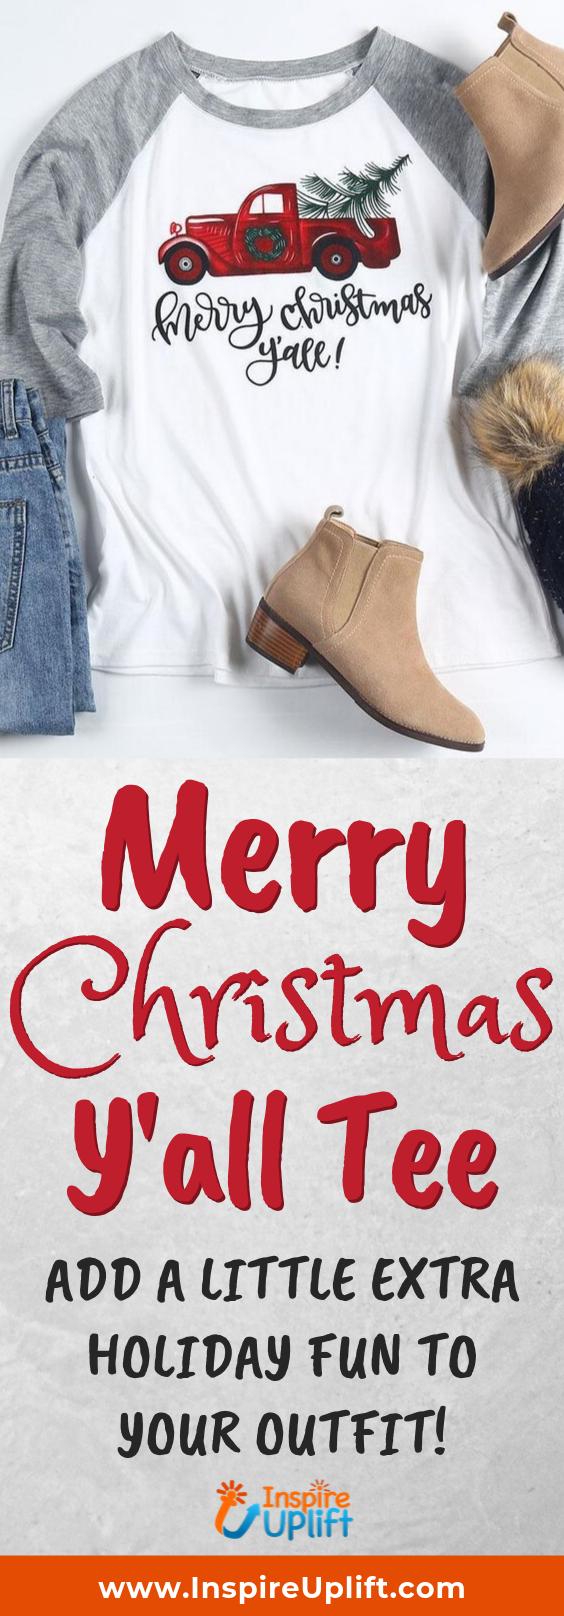 Merry Christmas Y'all Tee 😍 InspireUplift.com